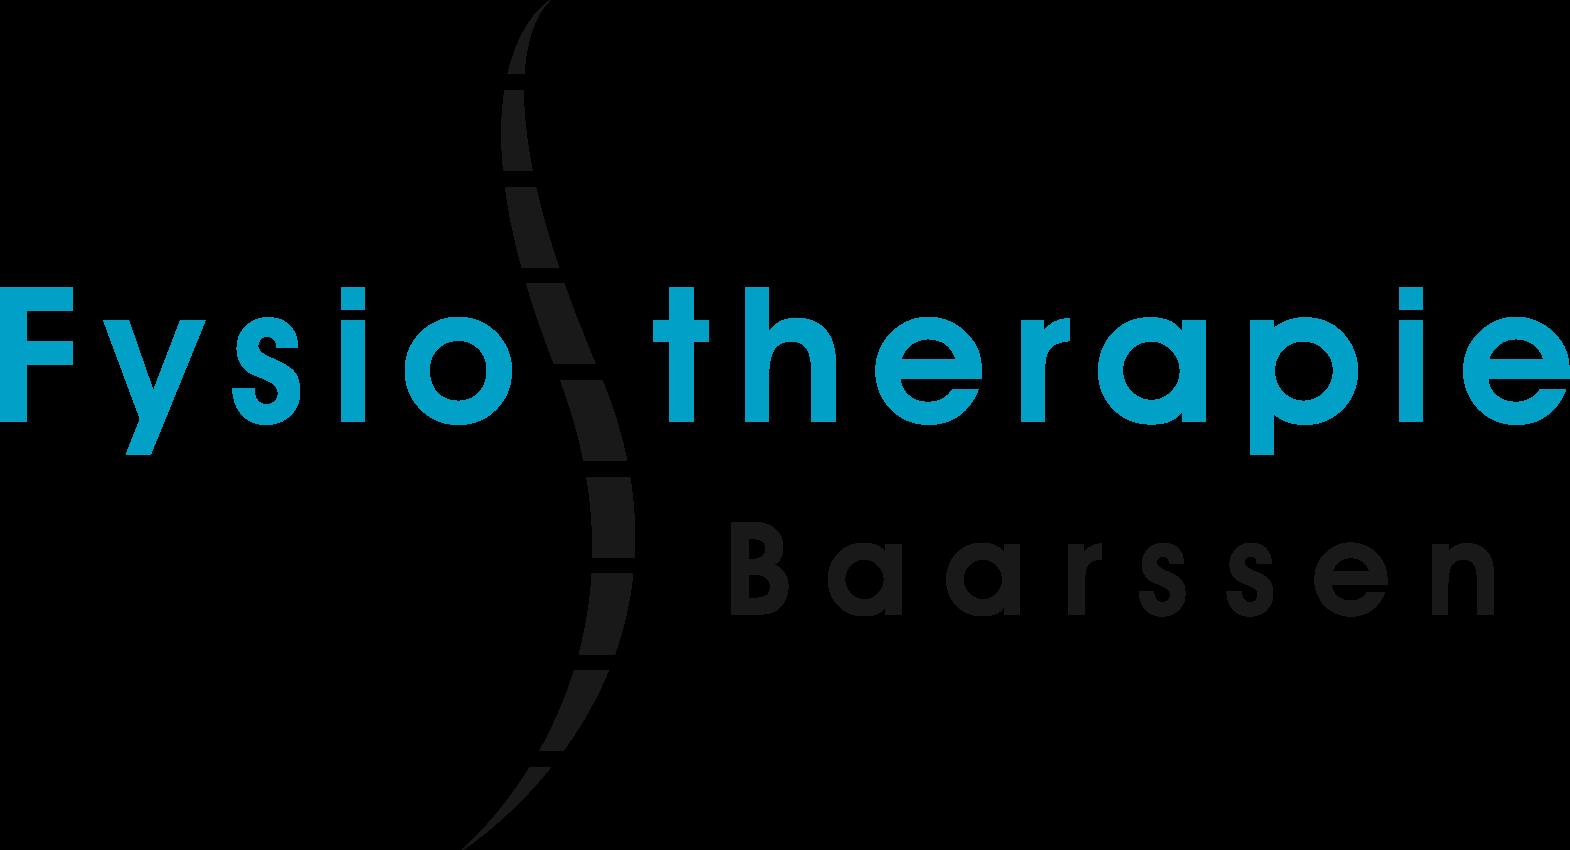 Fysiotherapie Baarssen